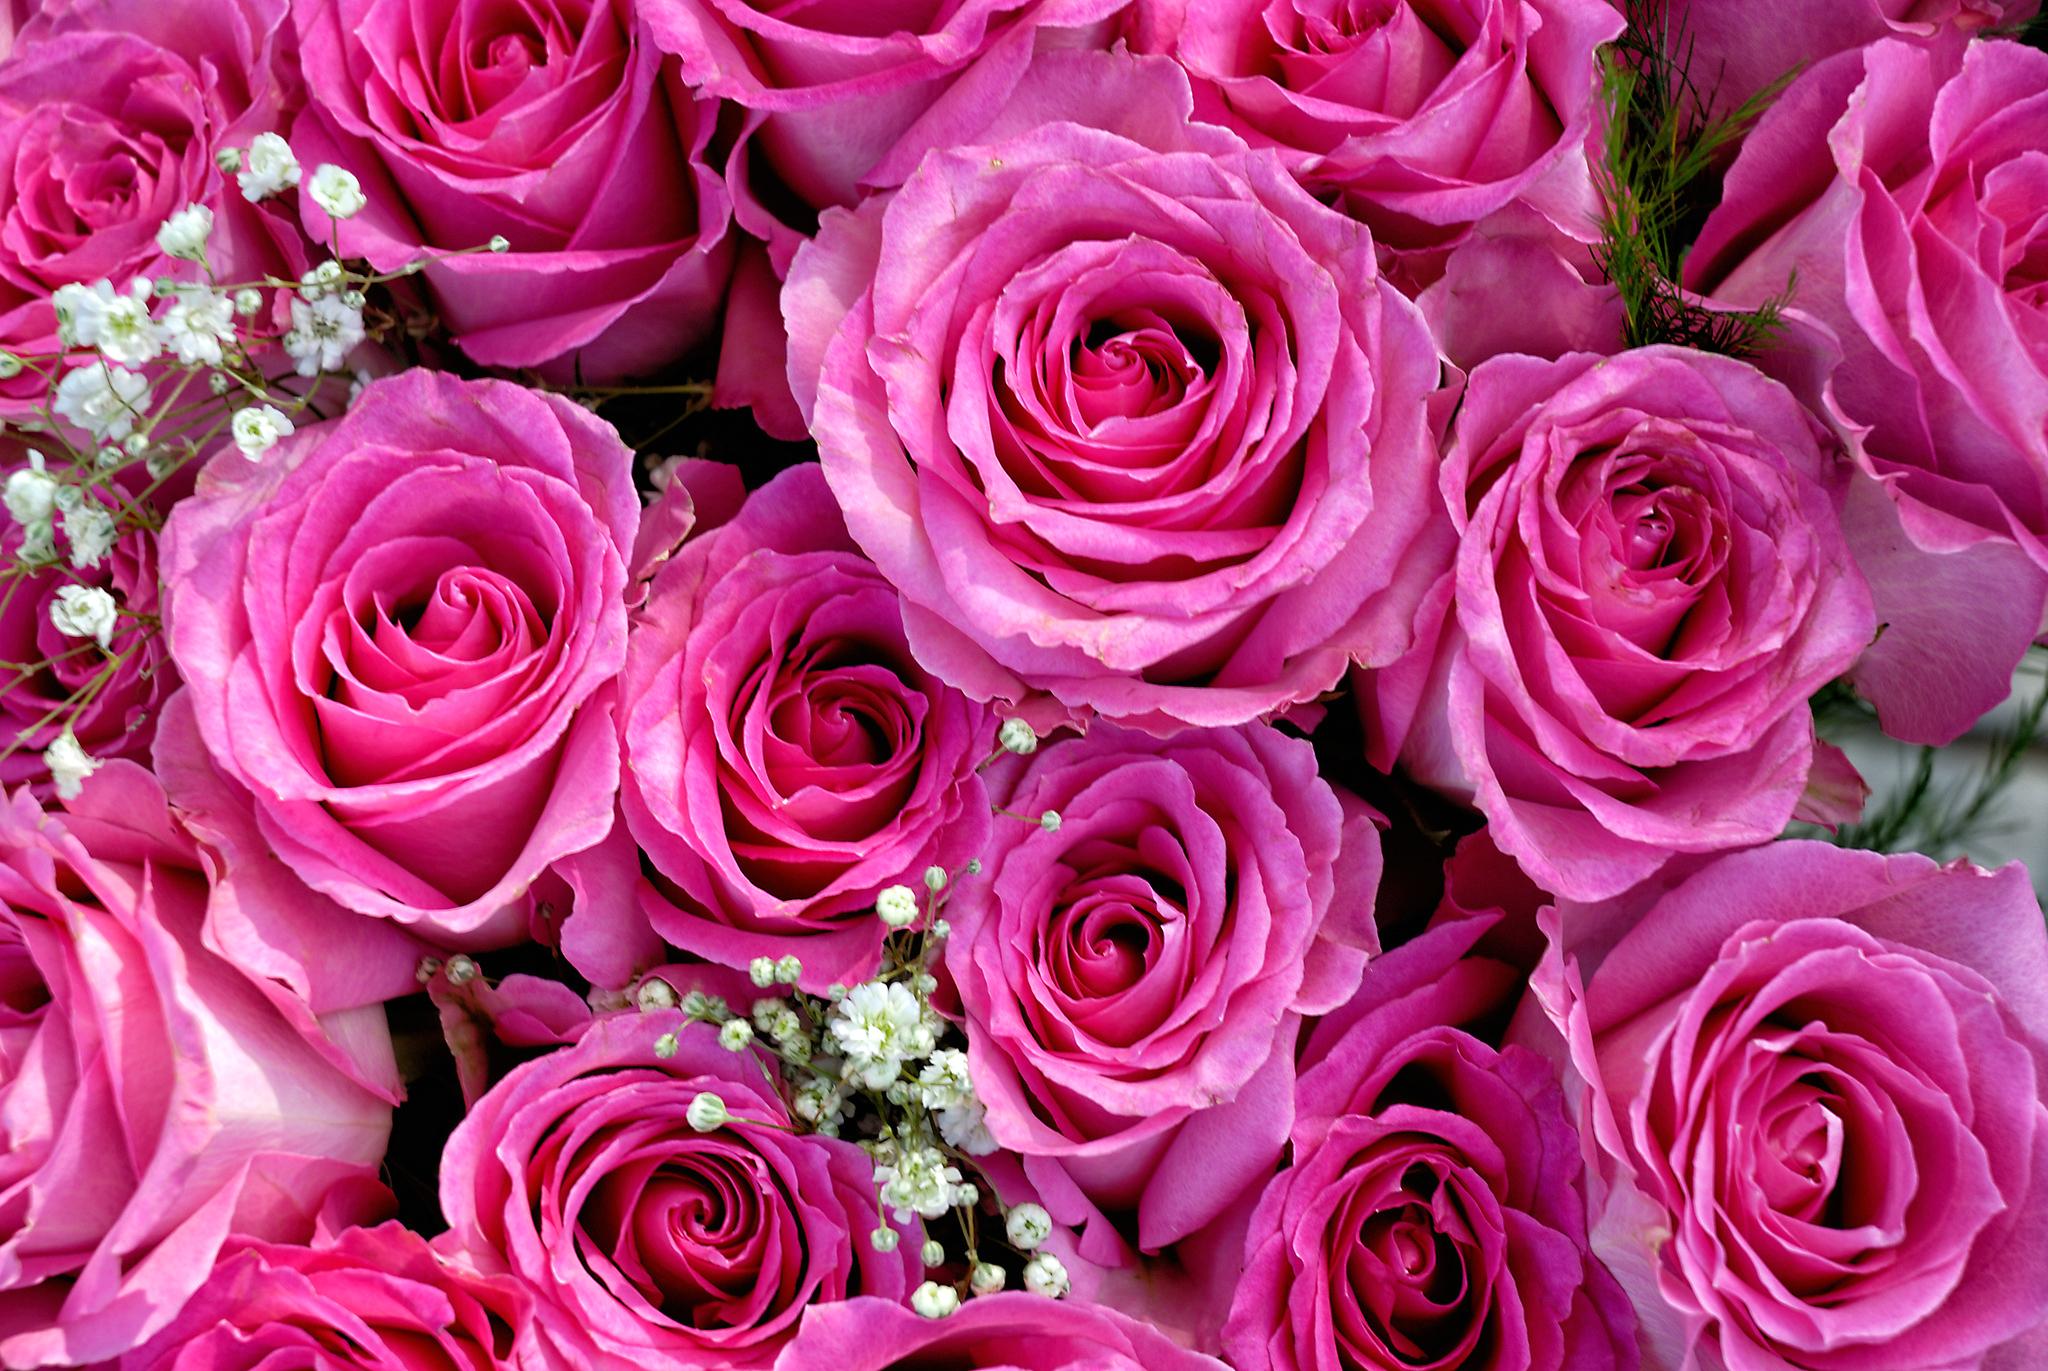 Картинки с розами для планшета